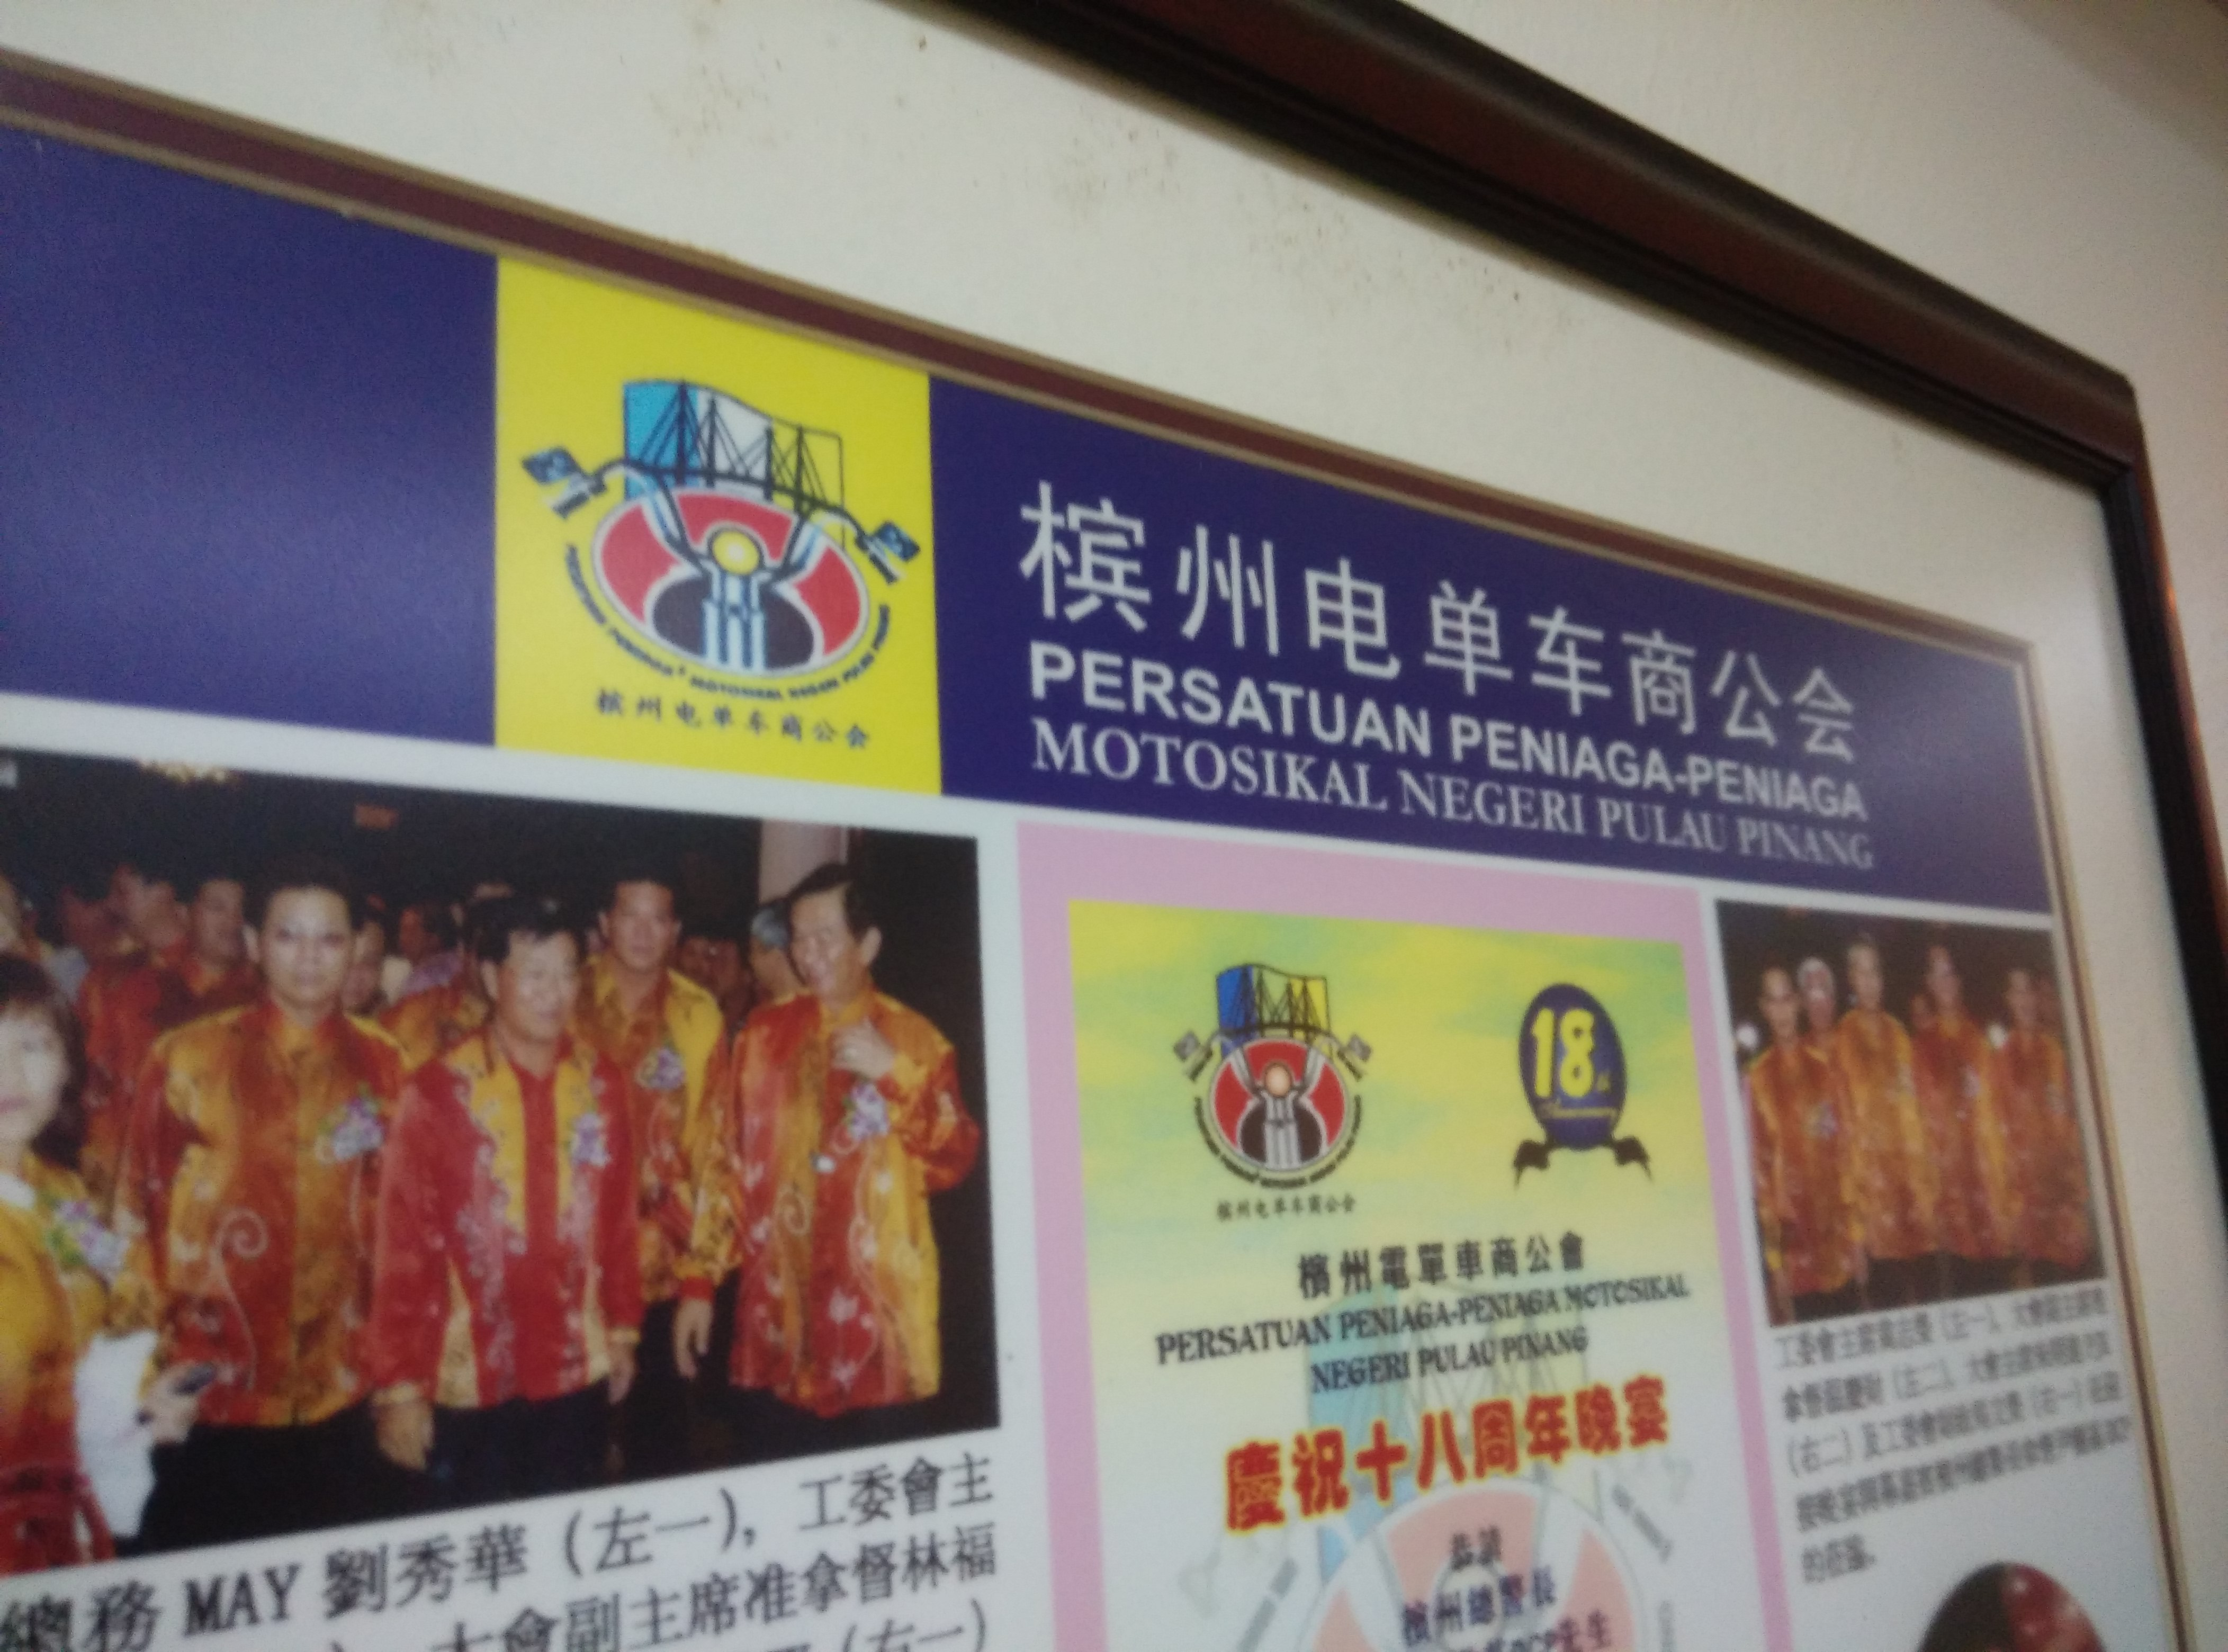 Penang Motorcycle Association